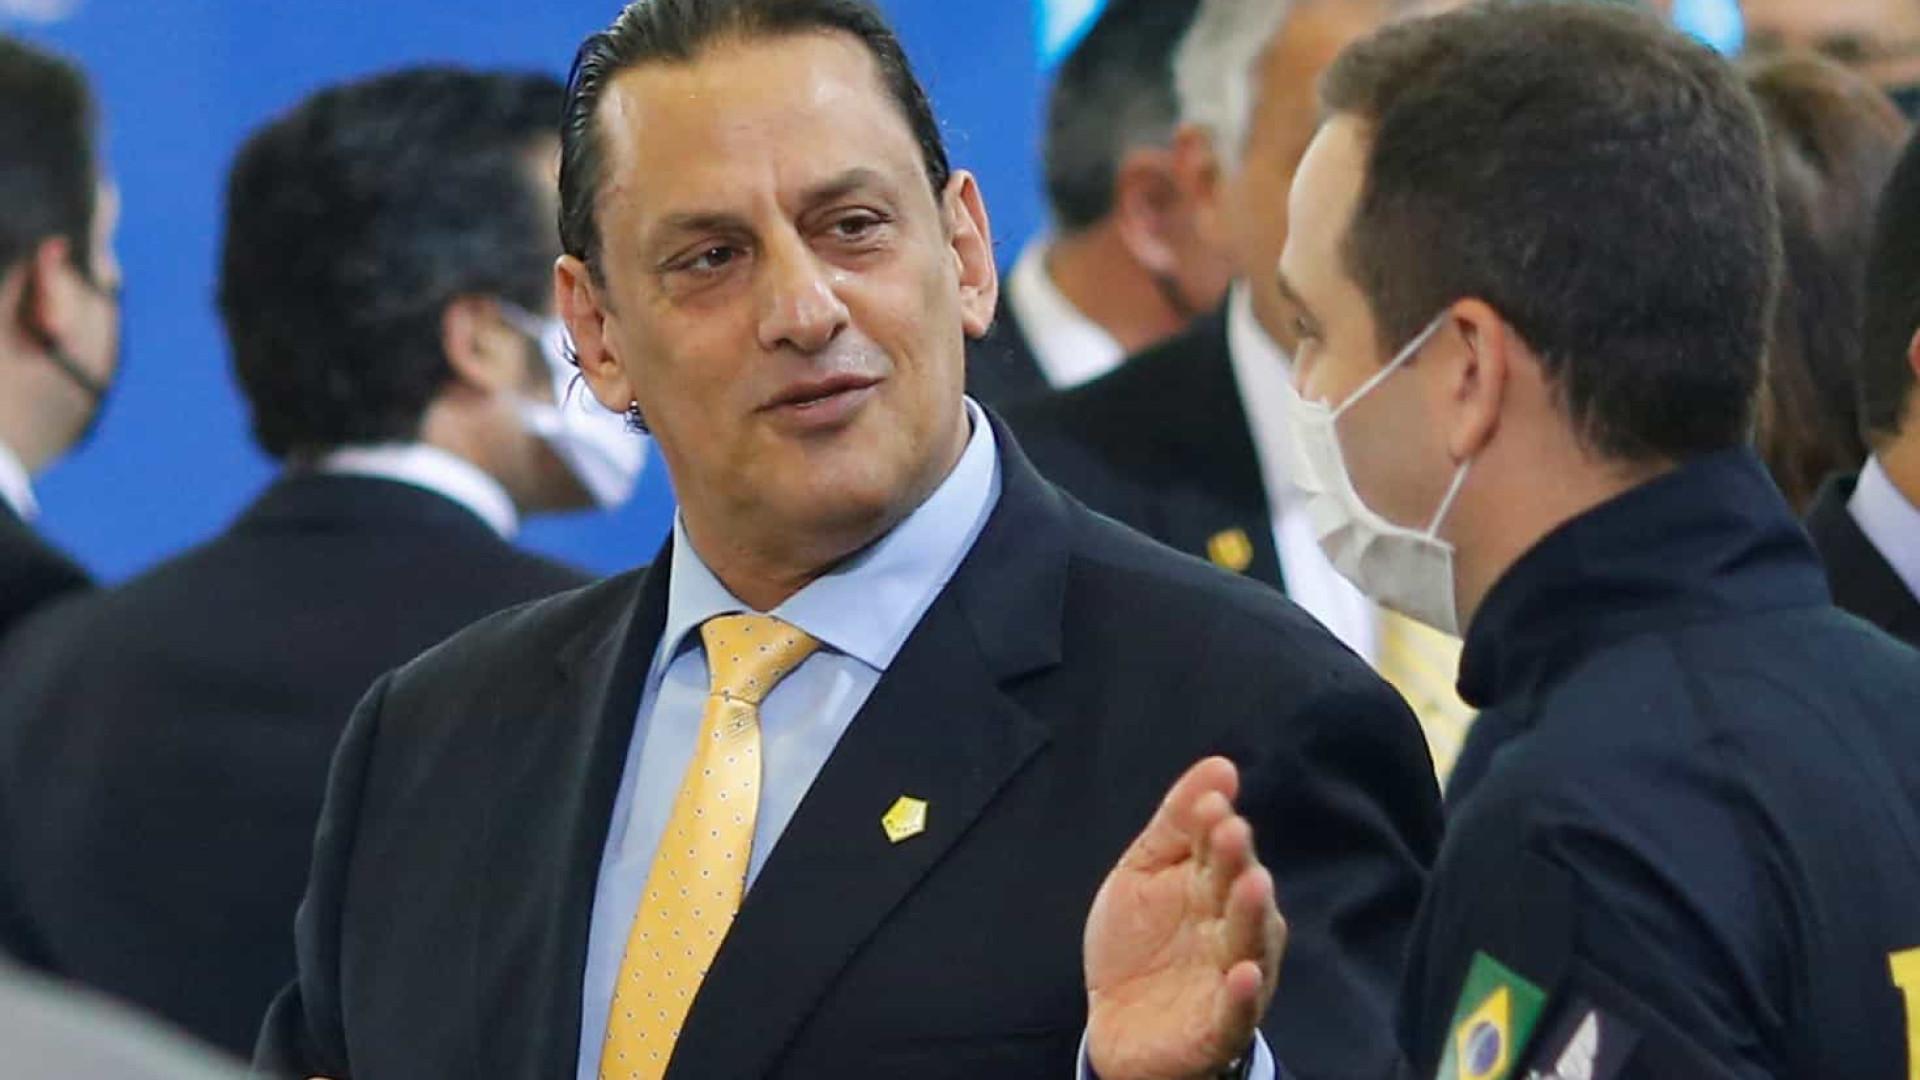 Lava Jato do Rio denuncia Wassef e mais 4 por desvios de R$ 4,6 mi no Sistema S